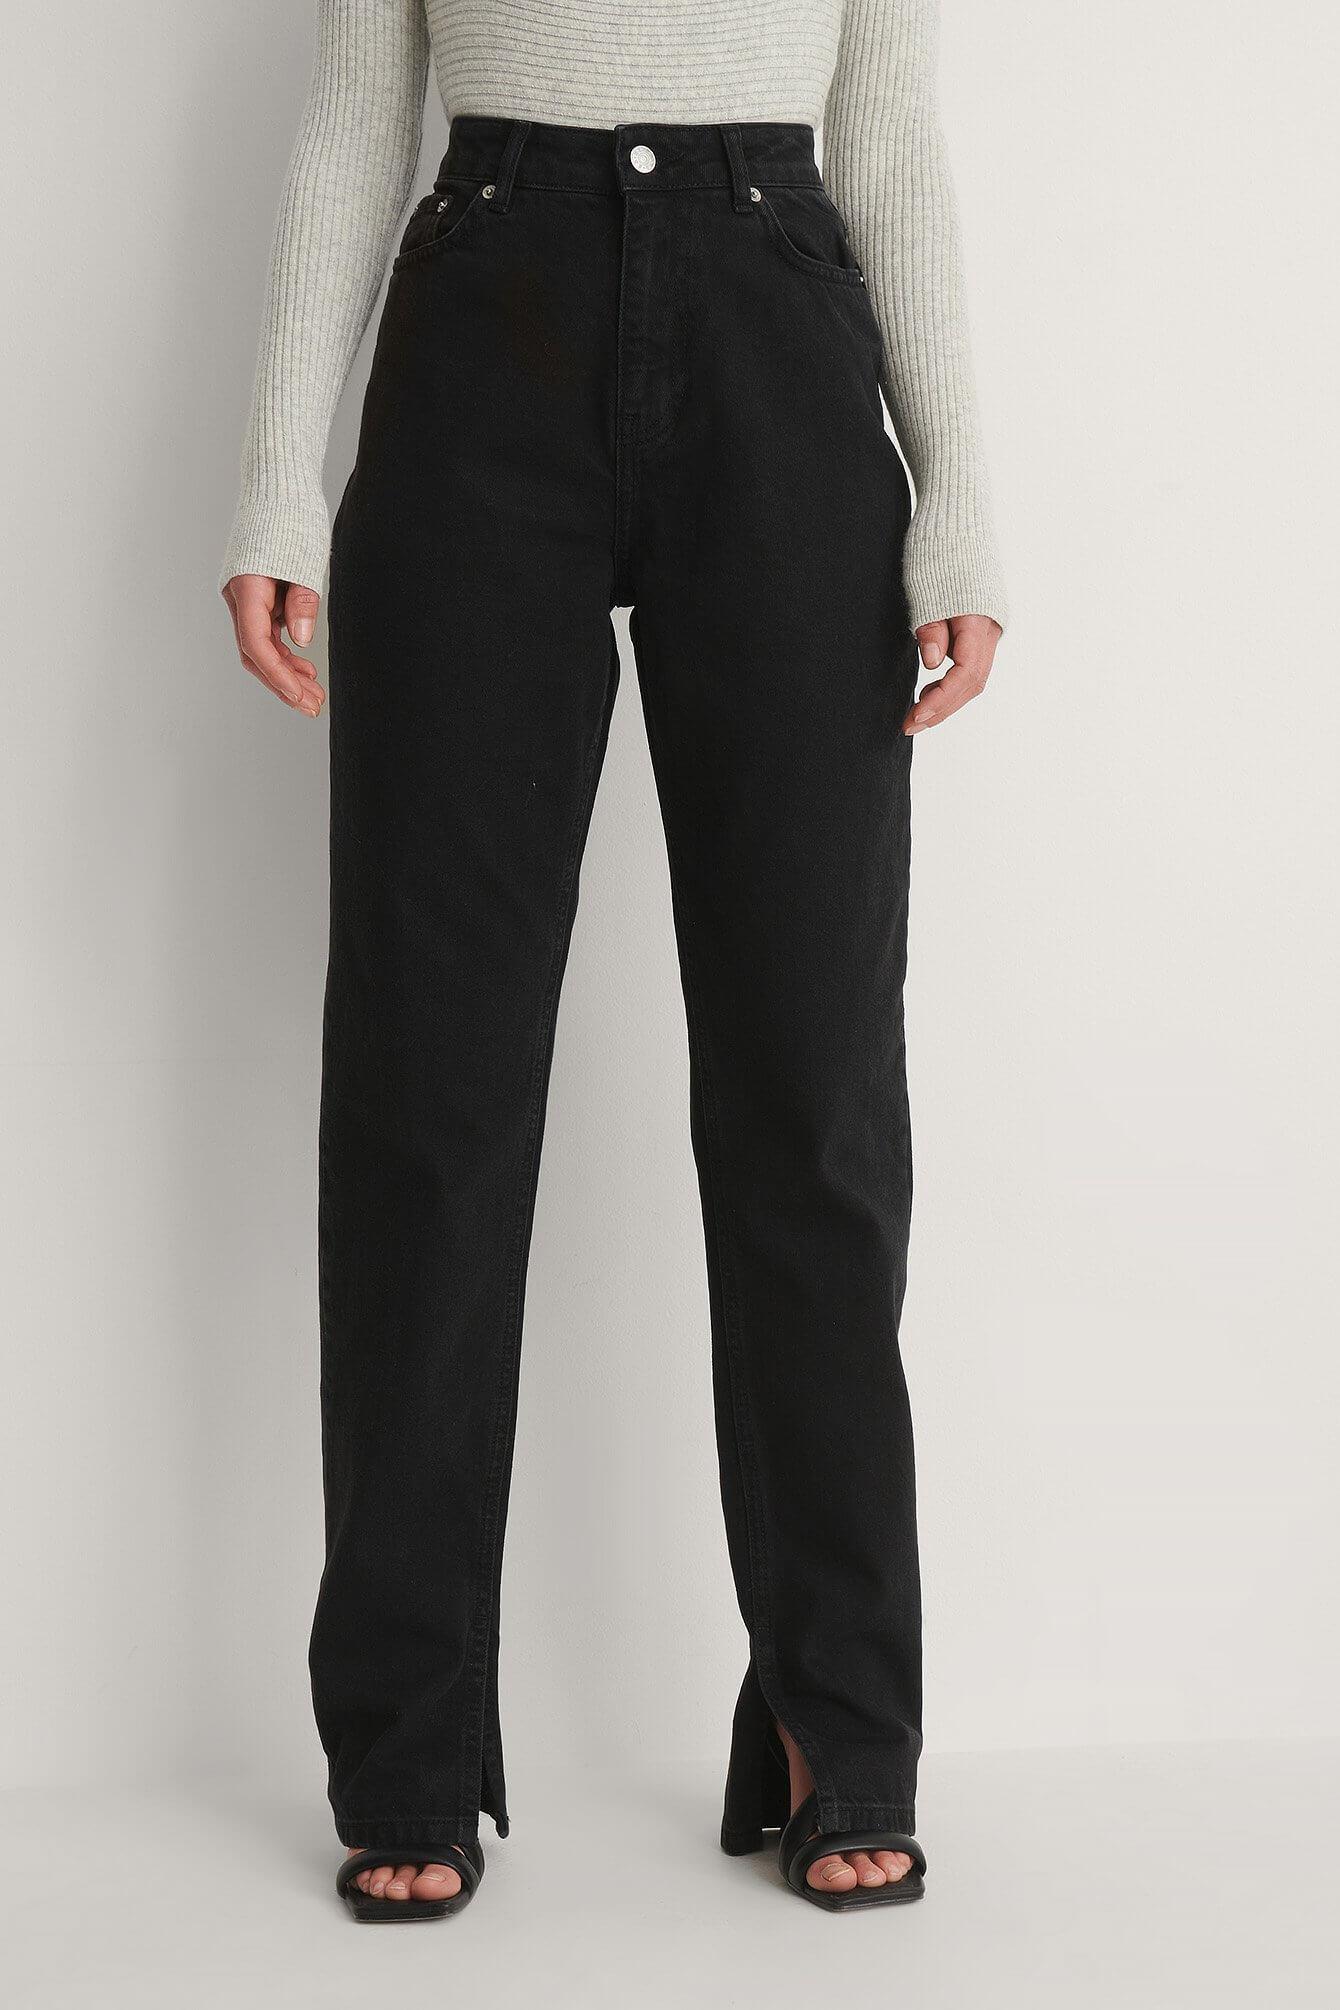 Ekologiska svarta, raka jeans från NA-KD.